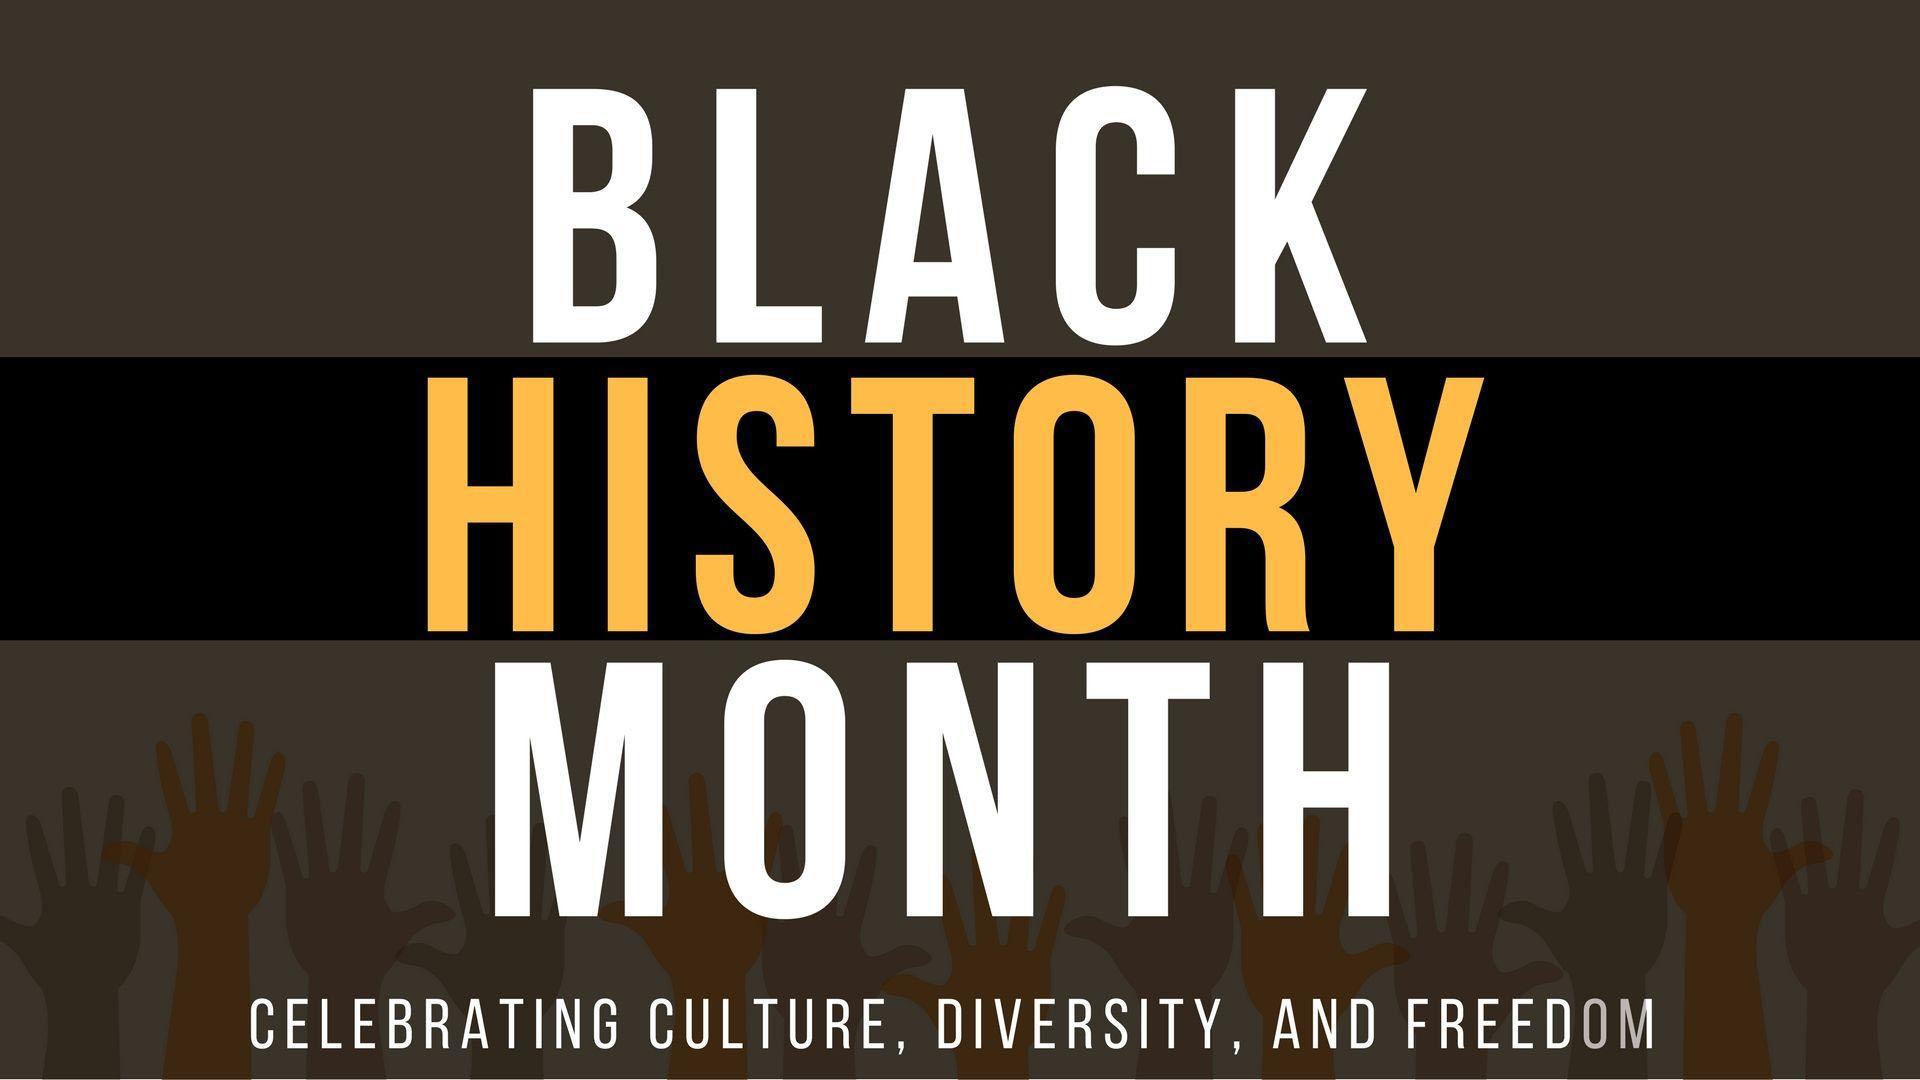 Black History Month February Digital Signage Graphic 3